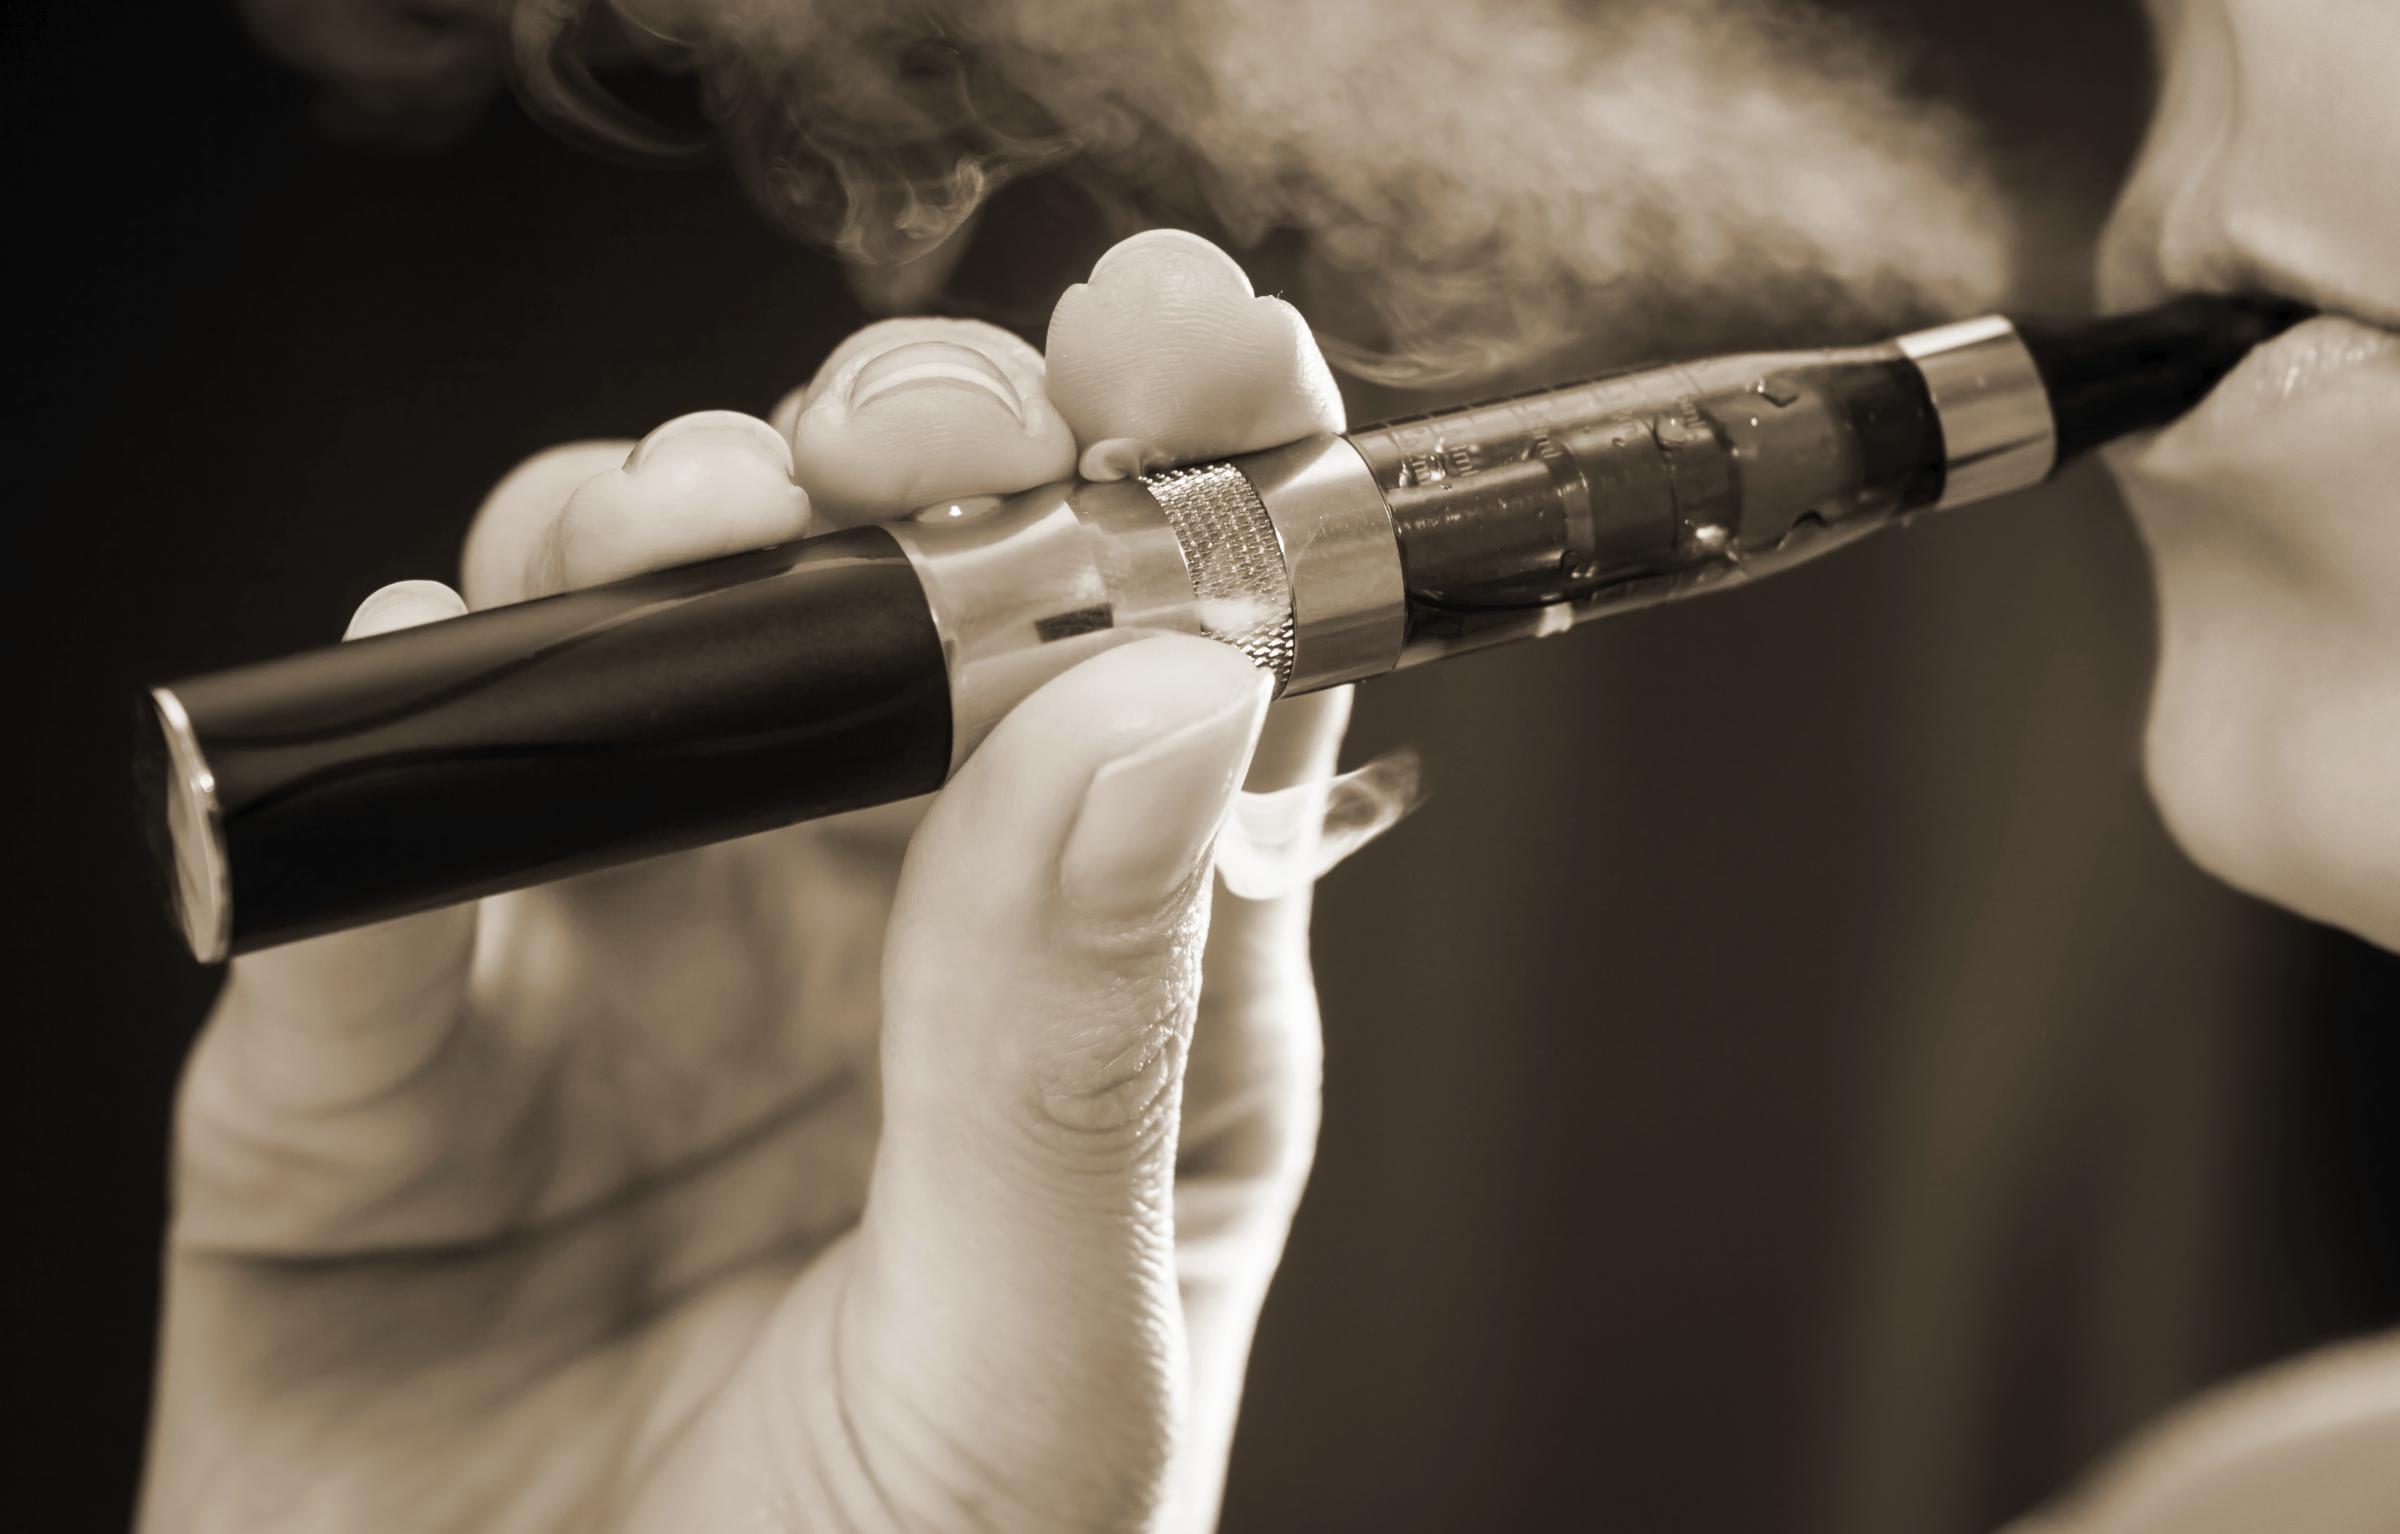 Electronic cigarette starter kit sale